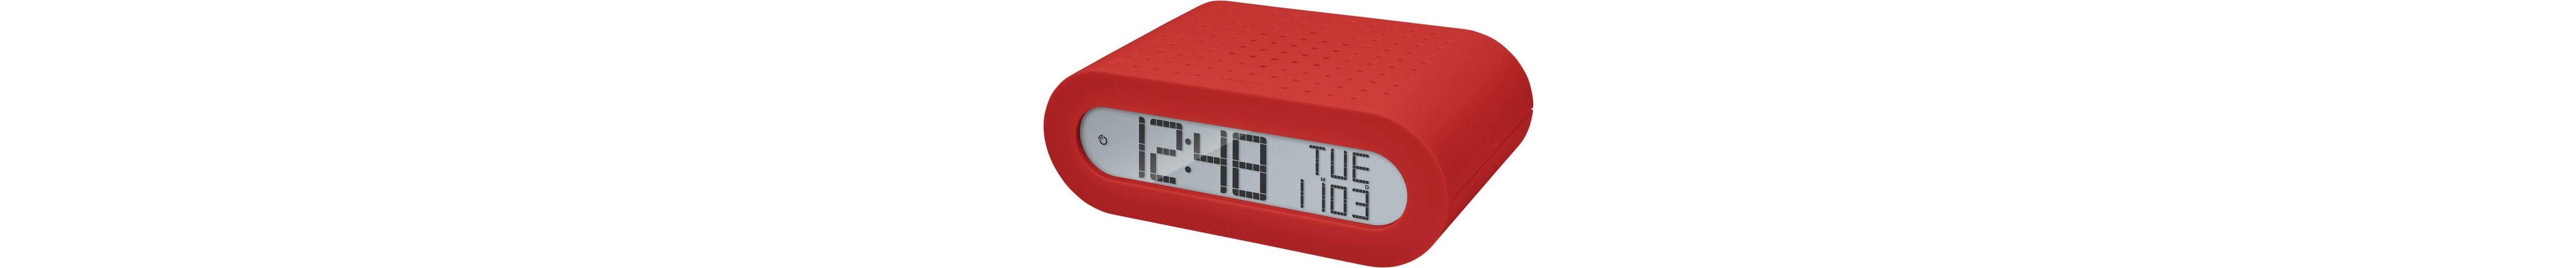 Oregon Scientific Radiowecker, »RRM 116 red, 2374«